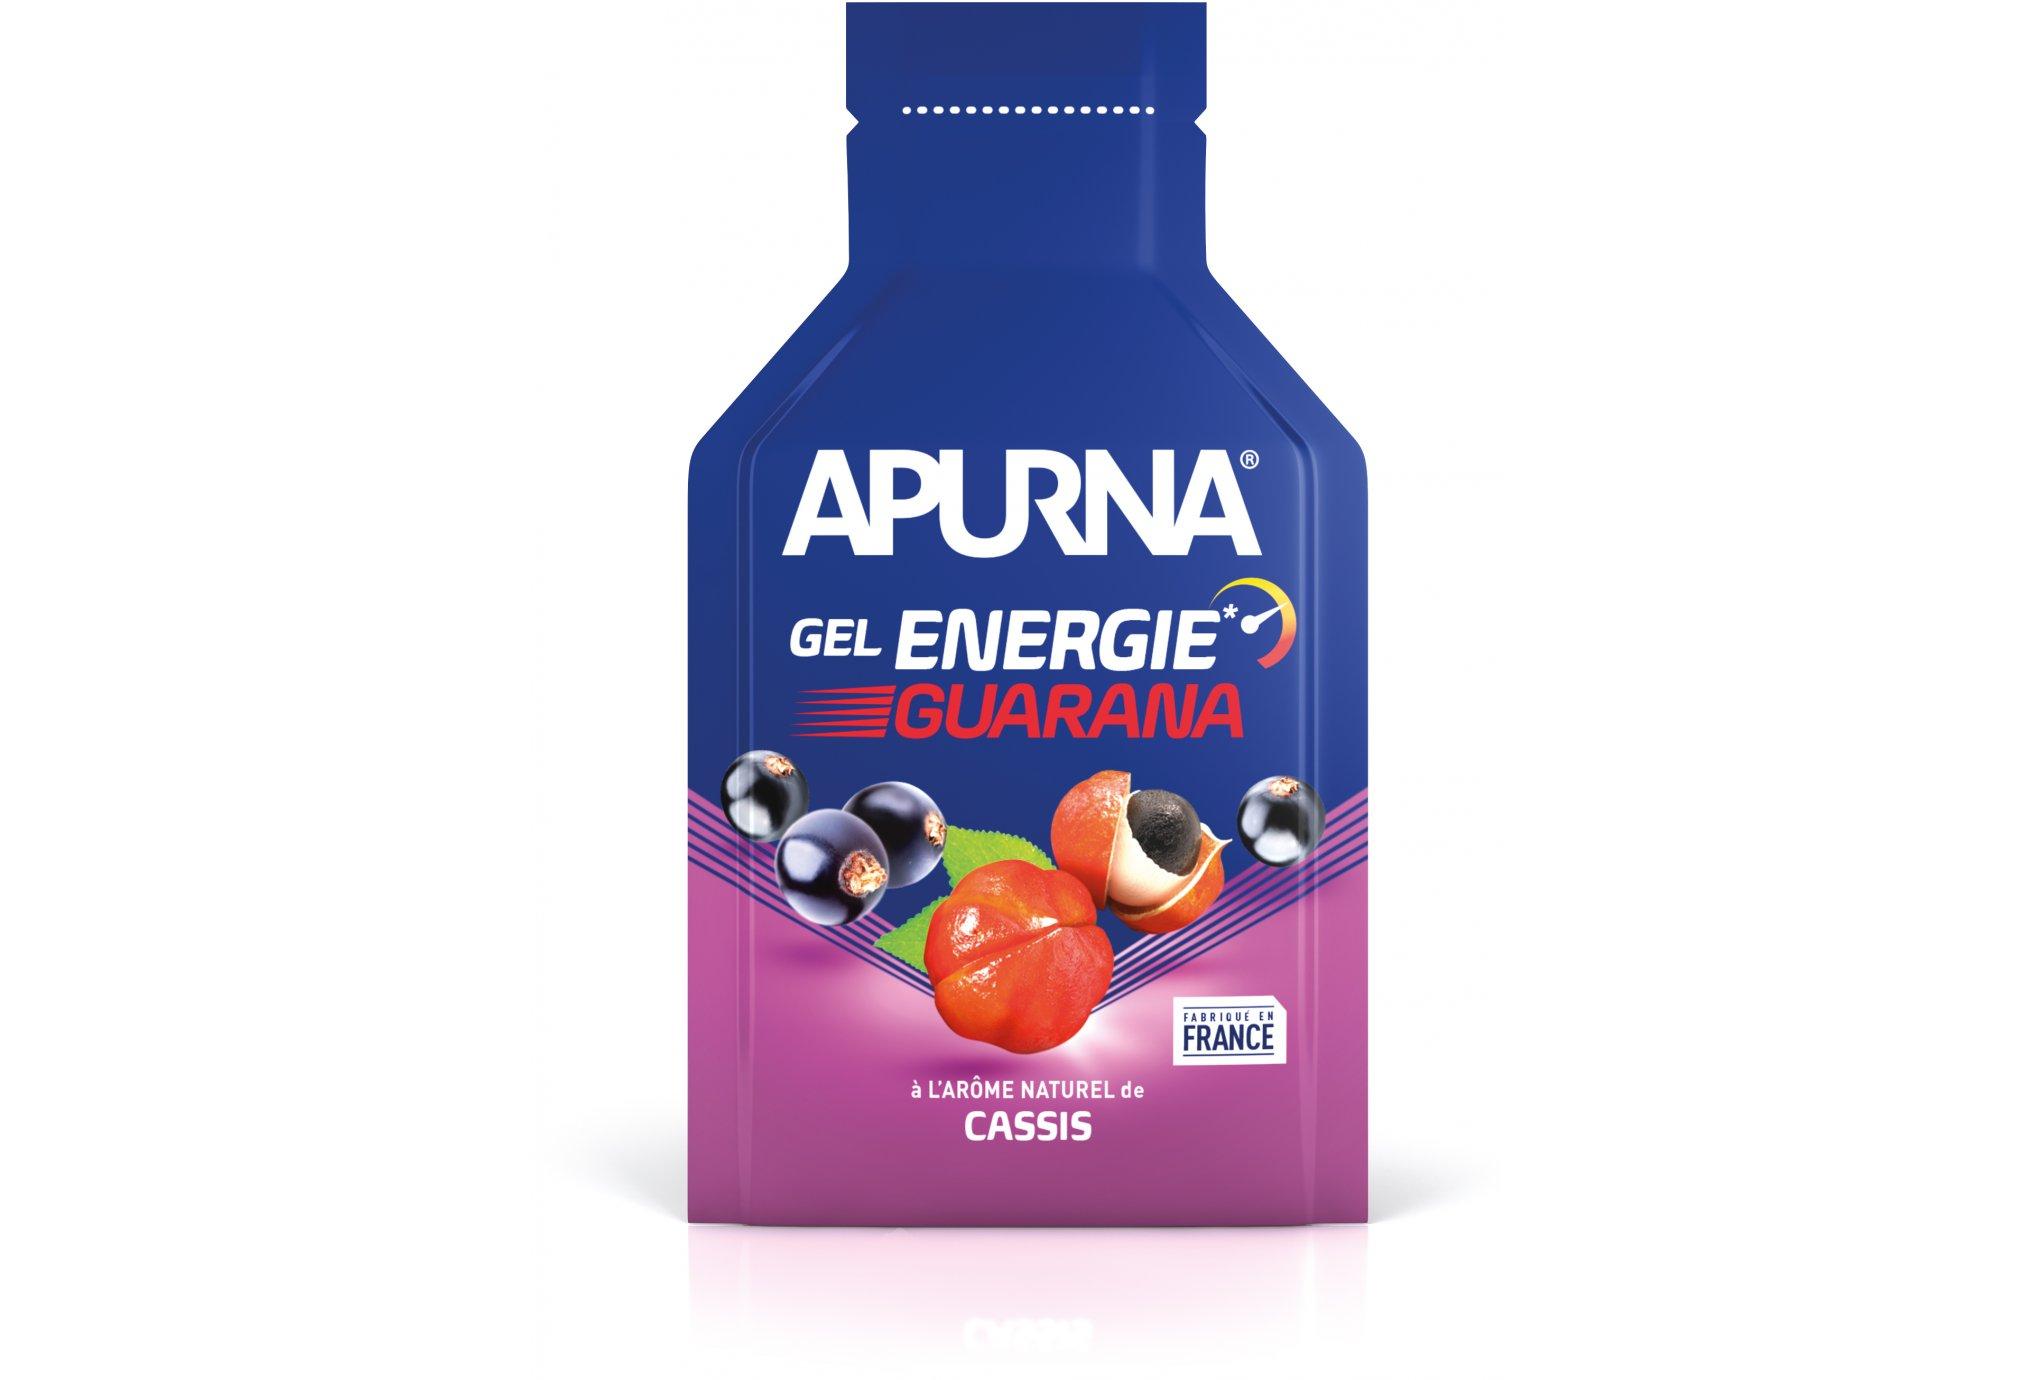 Apurna Gel energie guarana - cassis diététique gels